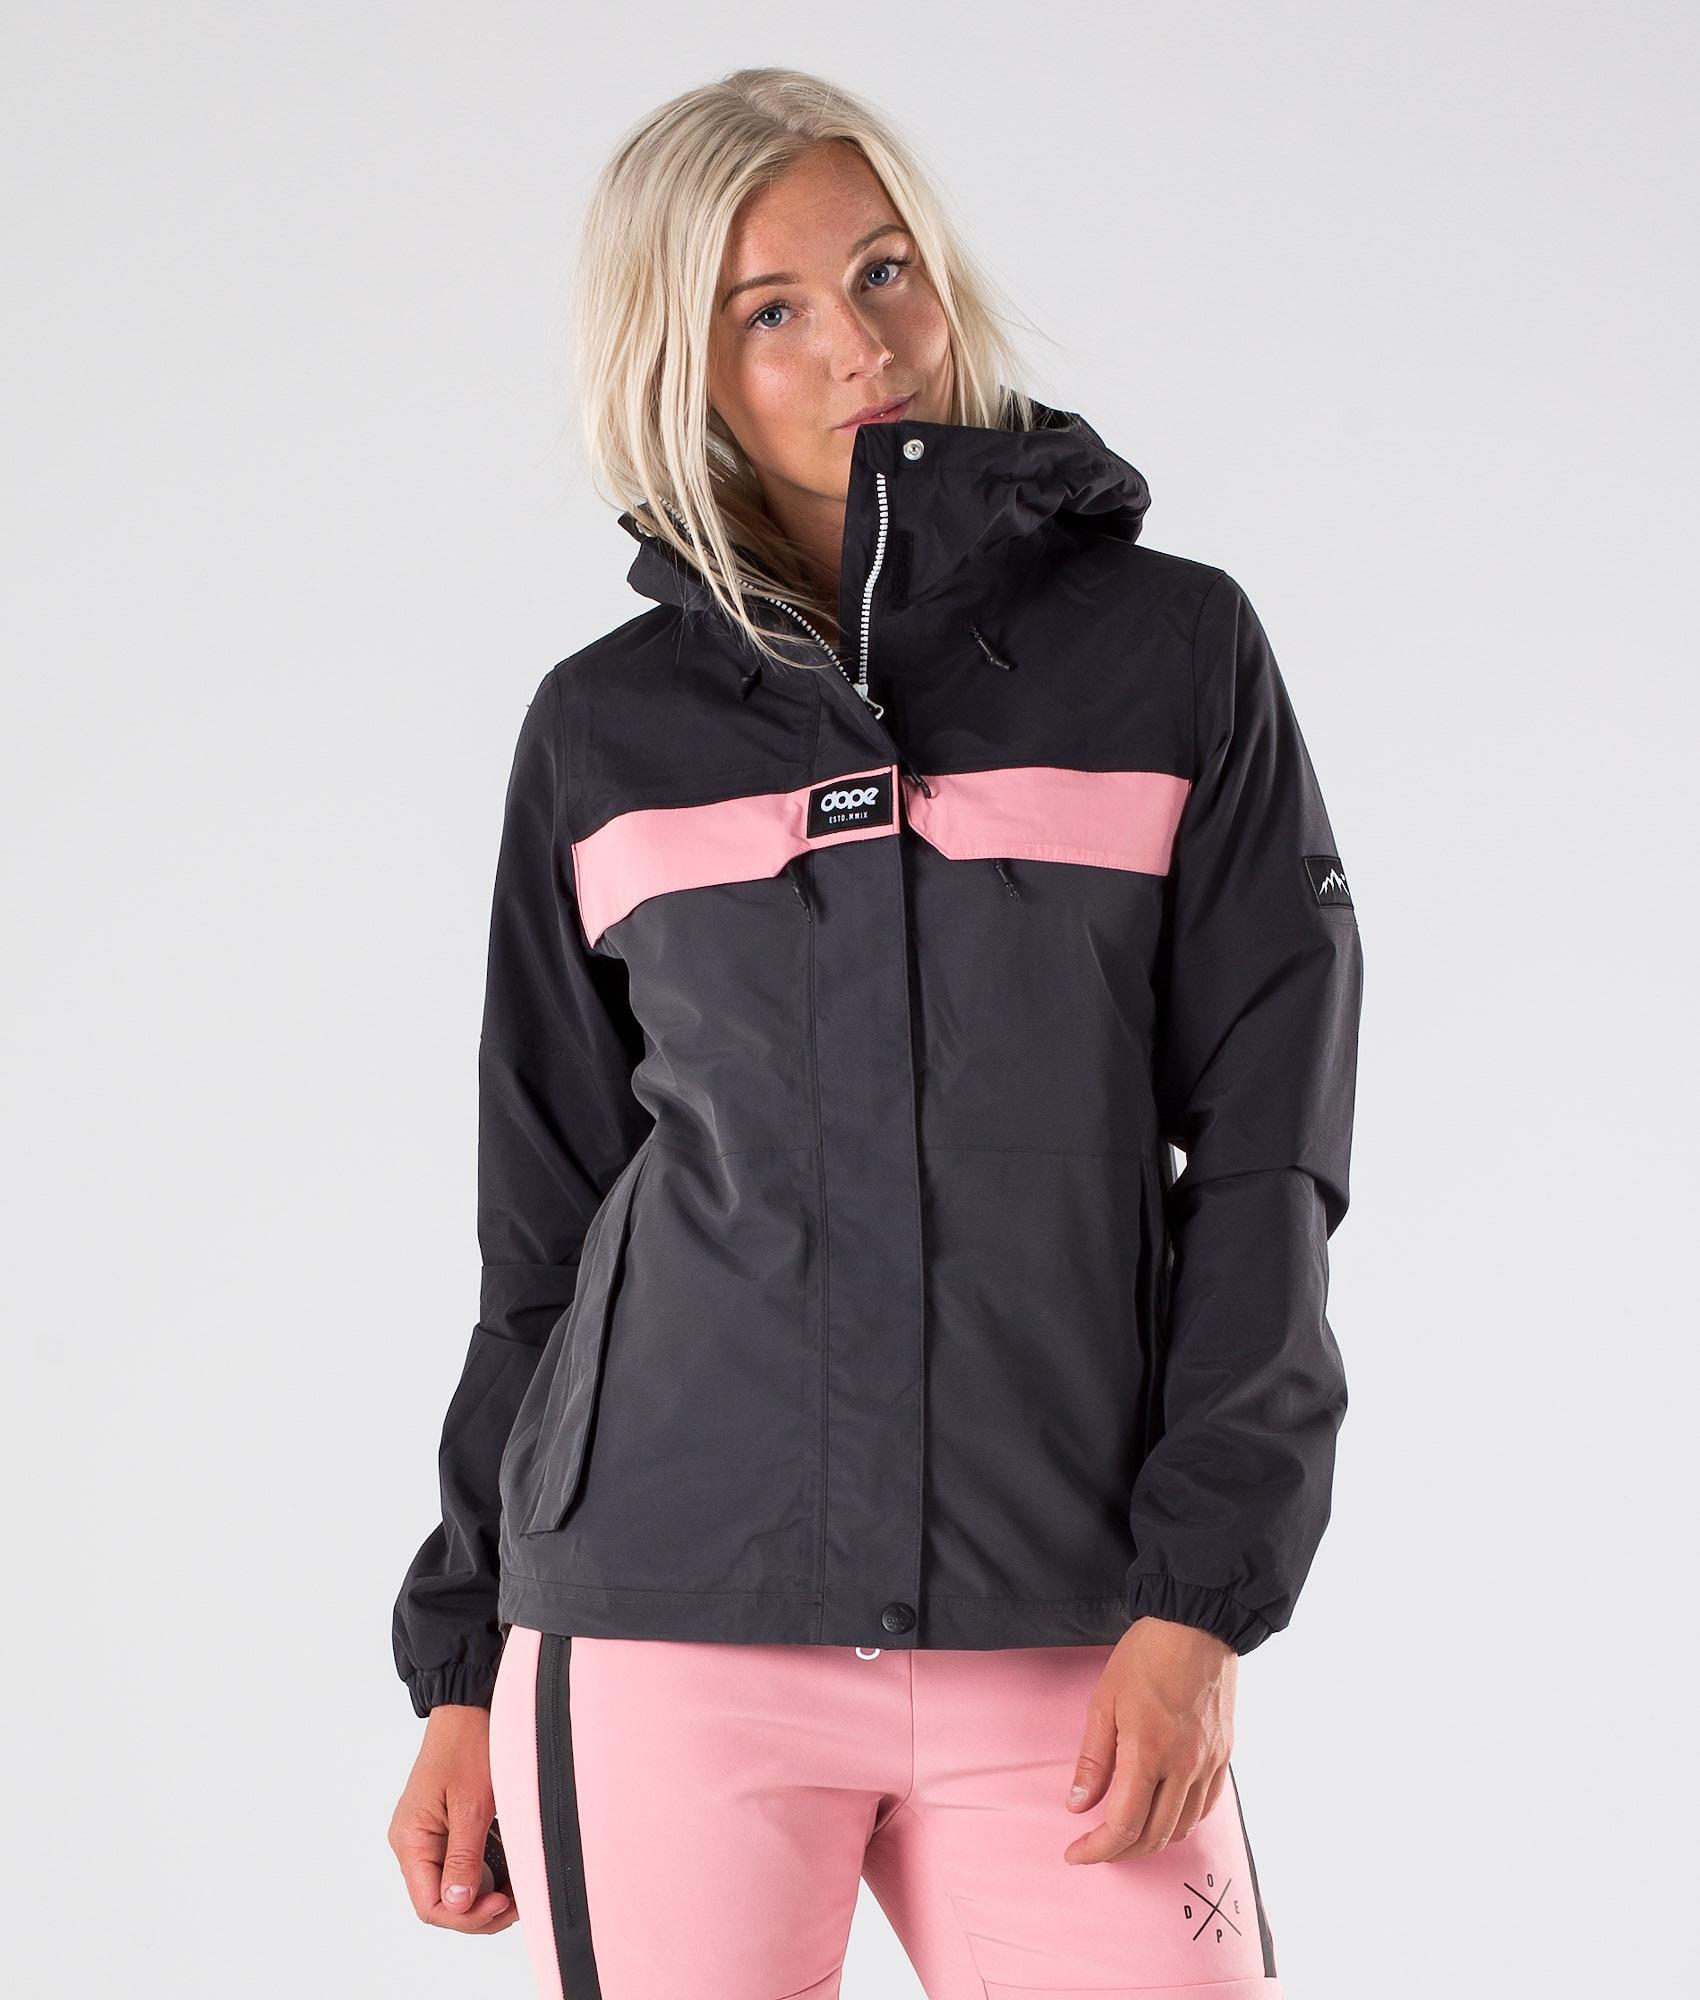 a39f82763609 Jackor Dam Streetwear | Fri Frakt | Ridestore.se